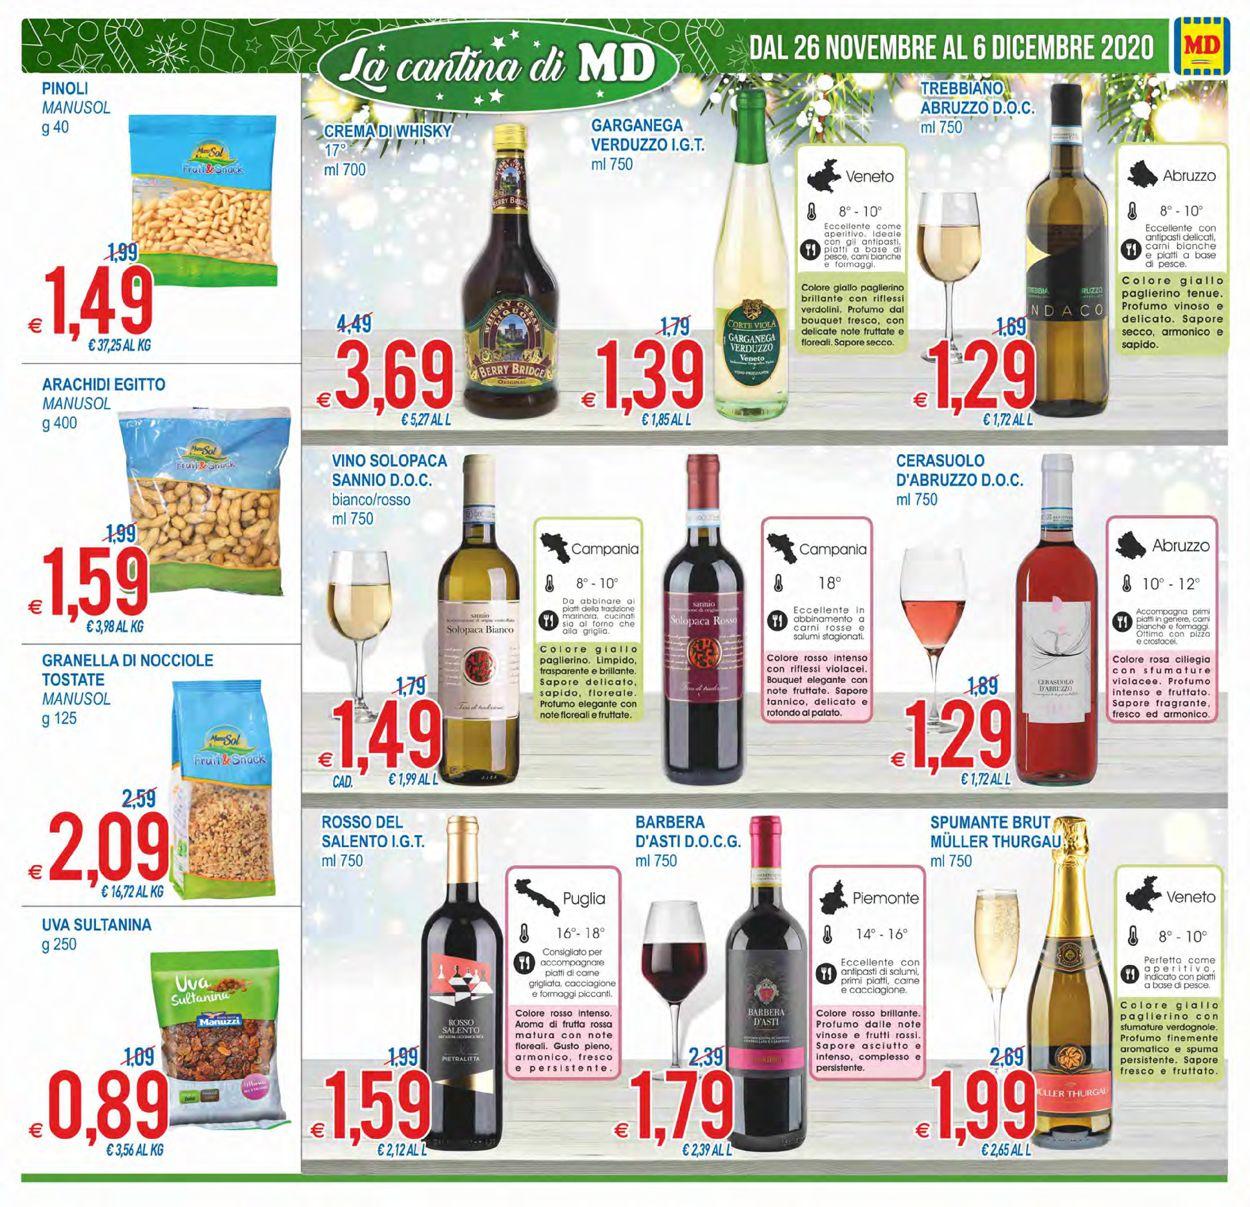 Volantino MD Discount - Black Friday 2020 - Offerte 26/11-06/12/2020 (Pagina 11)